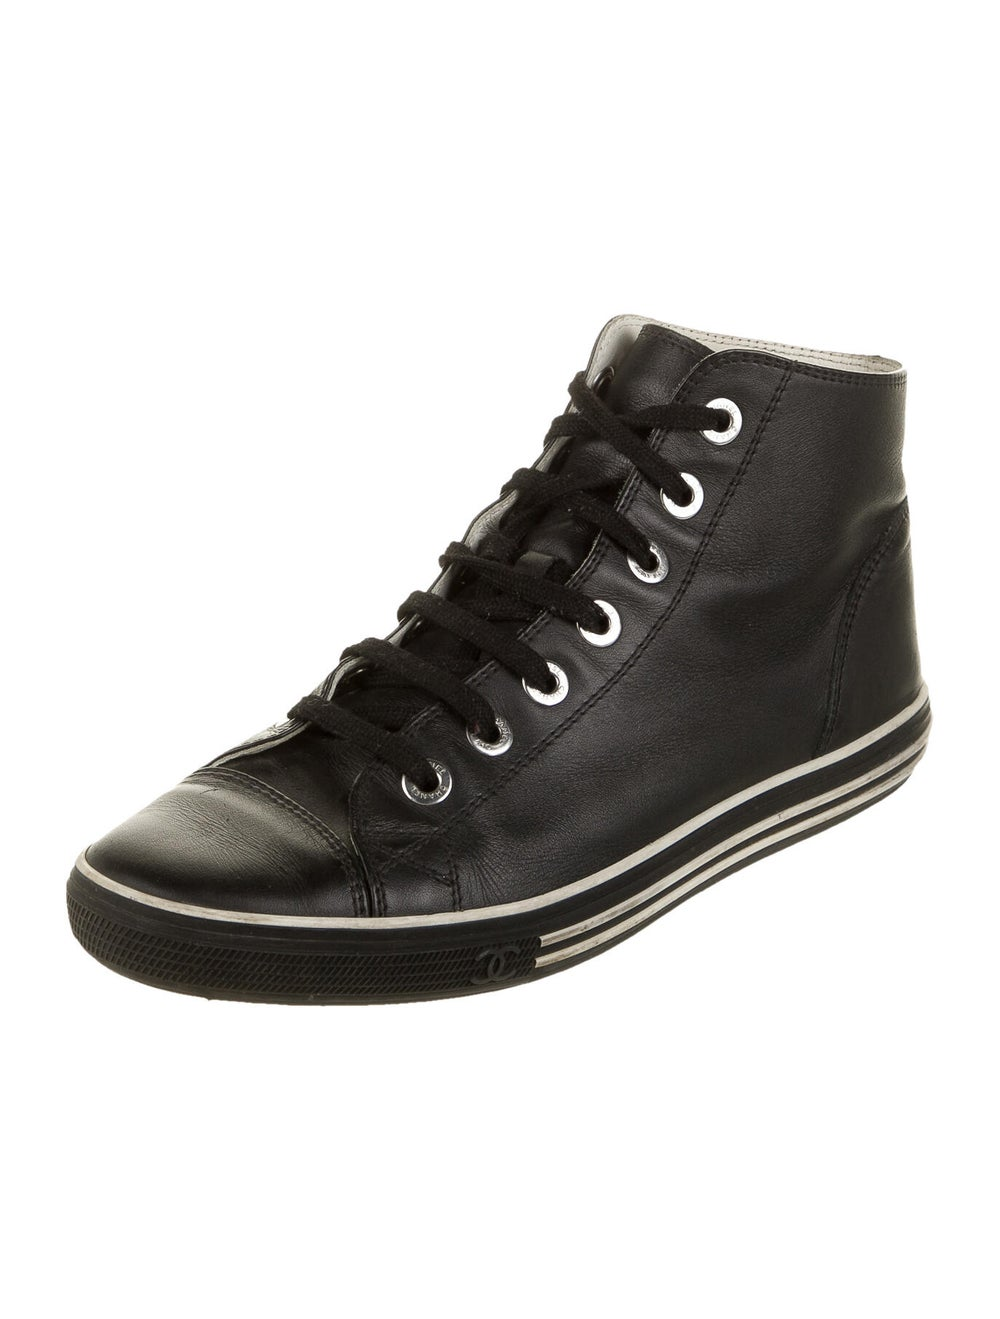 Chanel Interlocking CC Logo Leather Sneakers Black - image 2